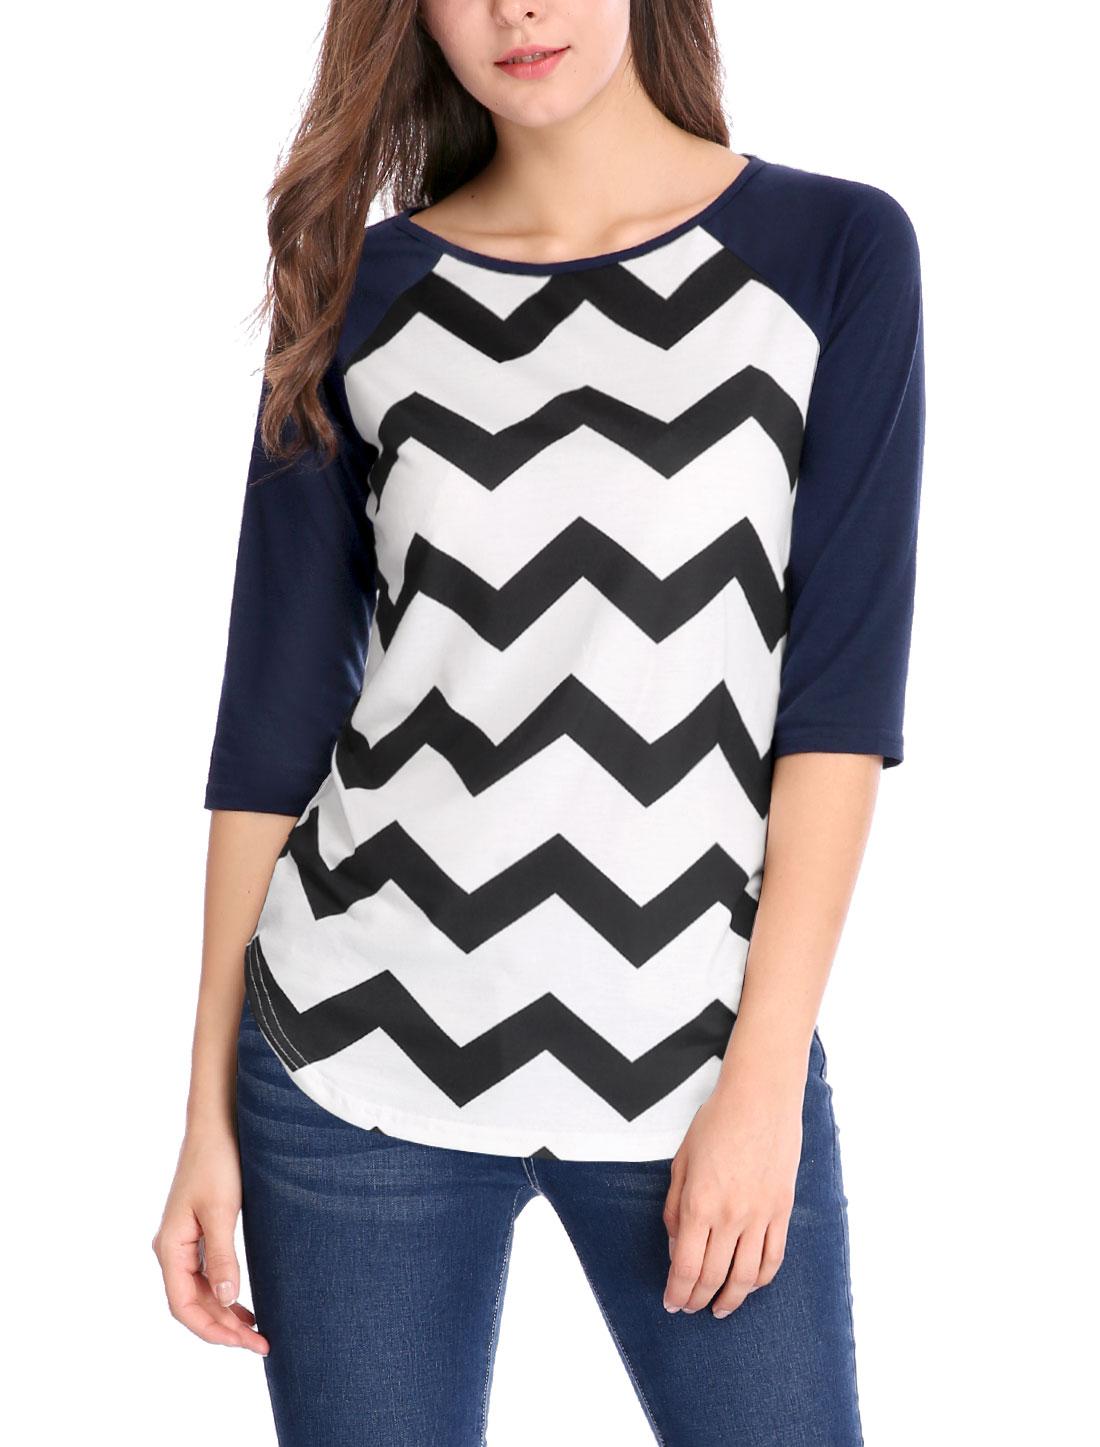 Women Chevron Contrast Color 3/4 Raglan Sleeves Top White M